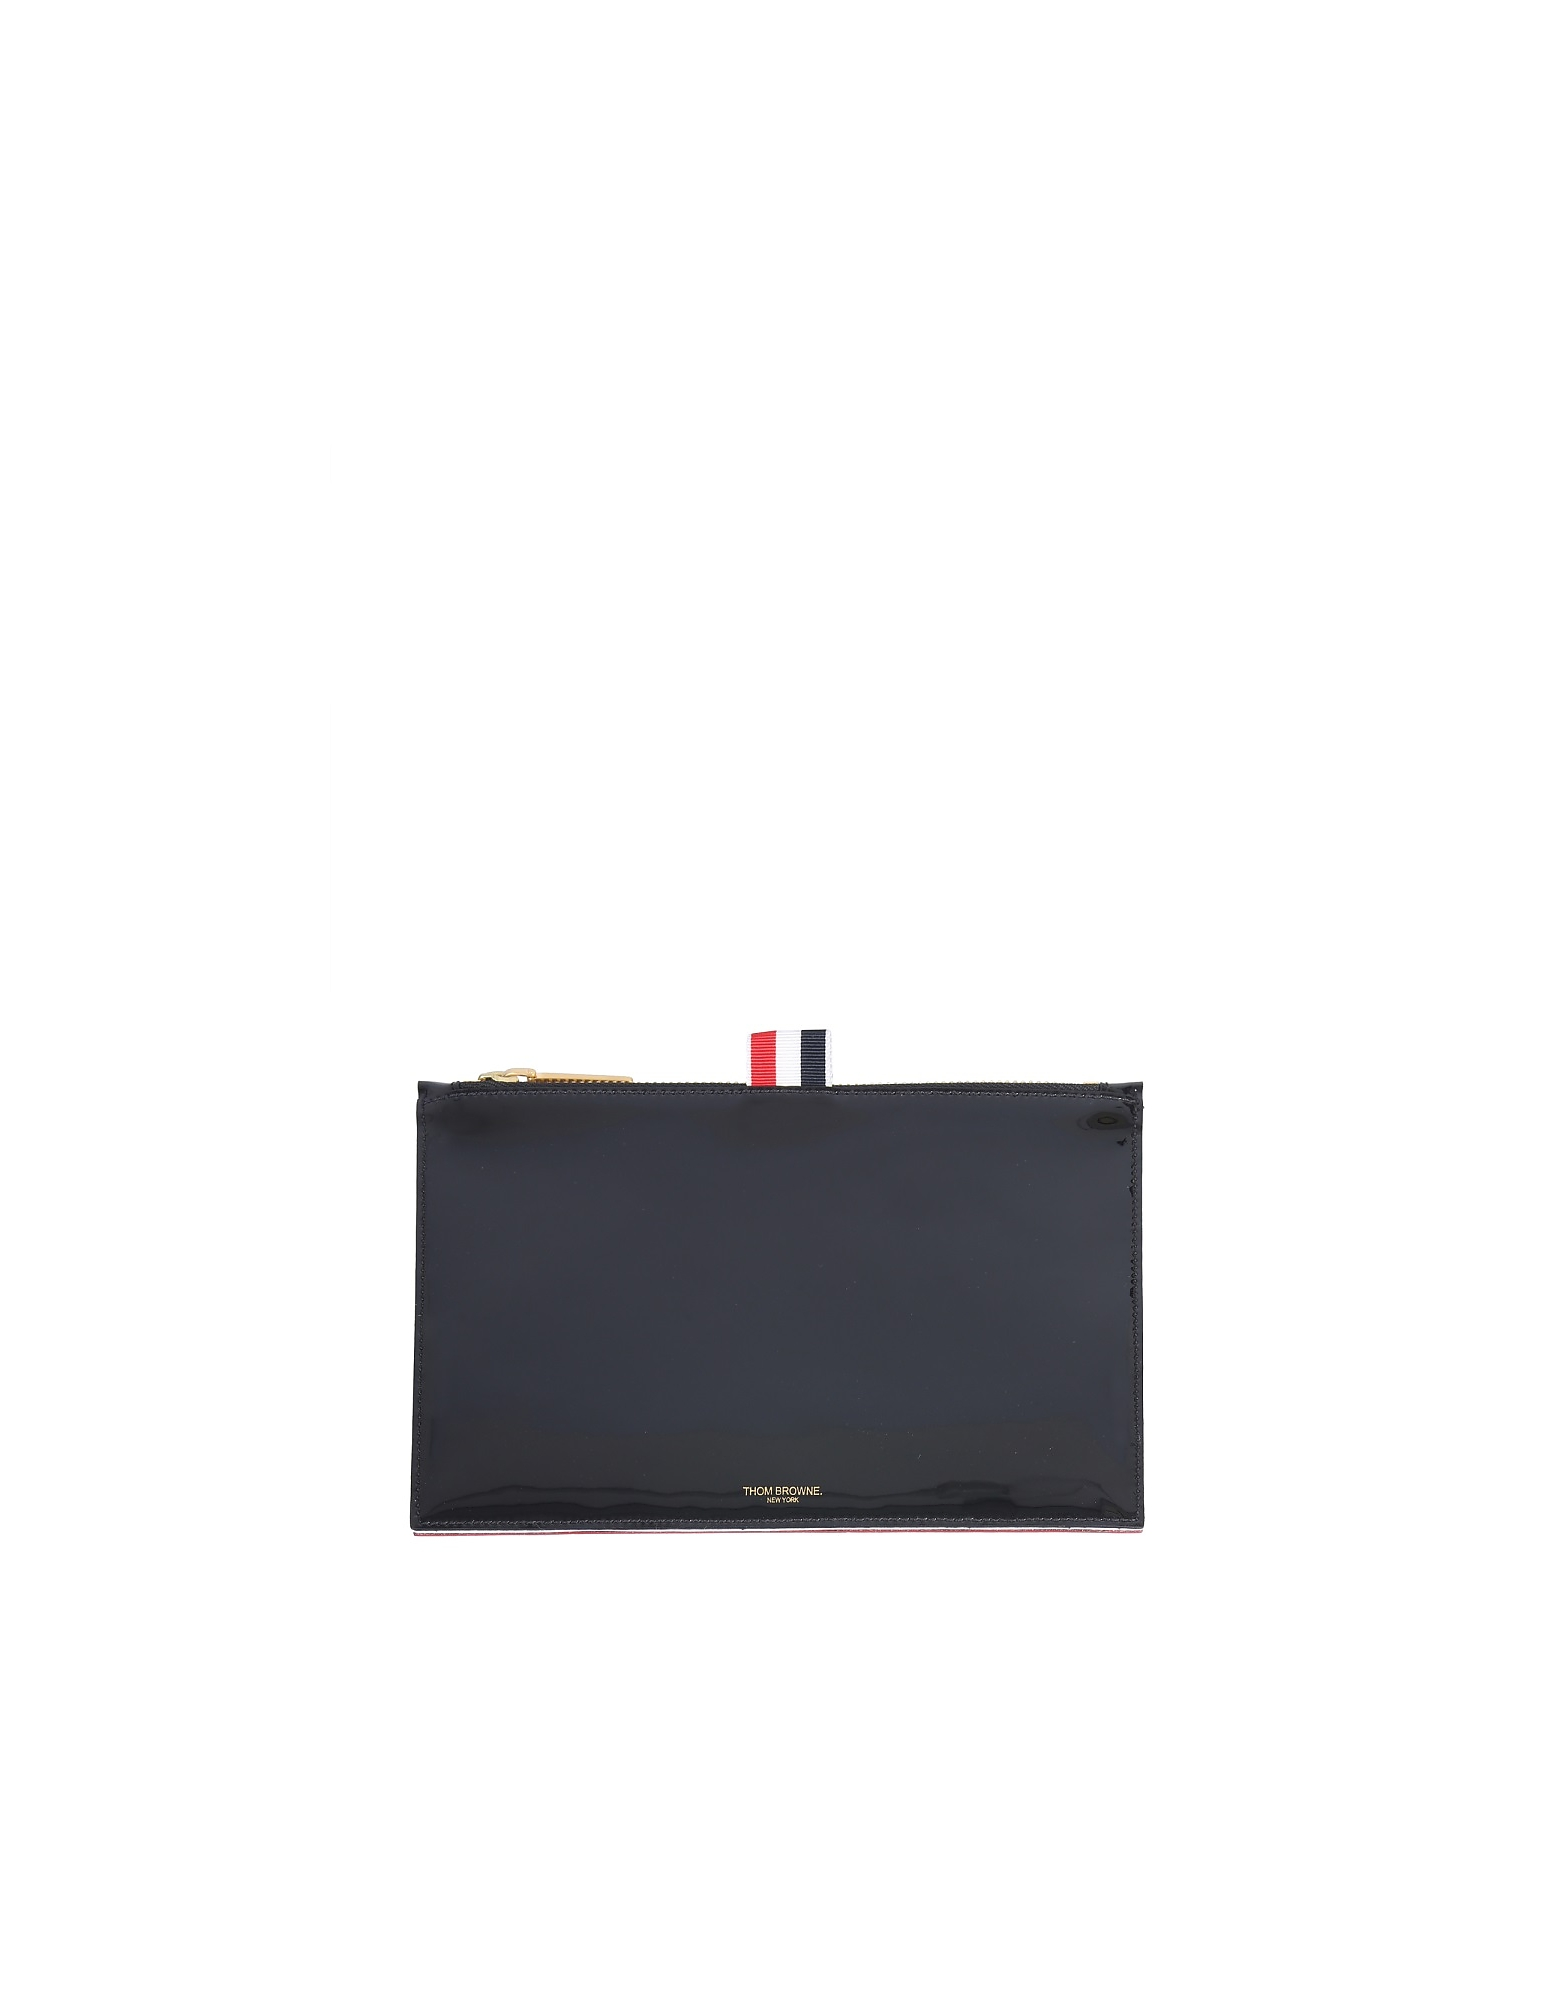 Thom Browne Designer Wallets, Large Purse photo